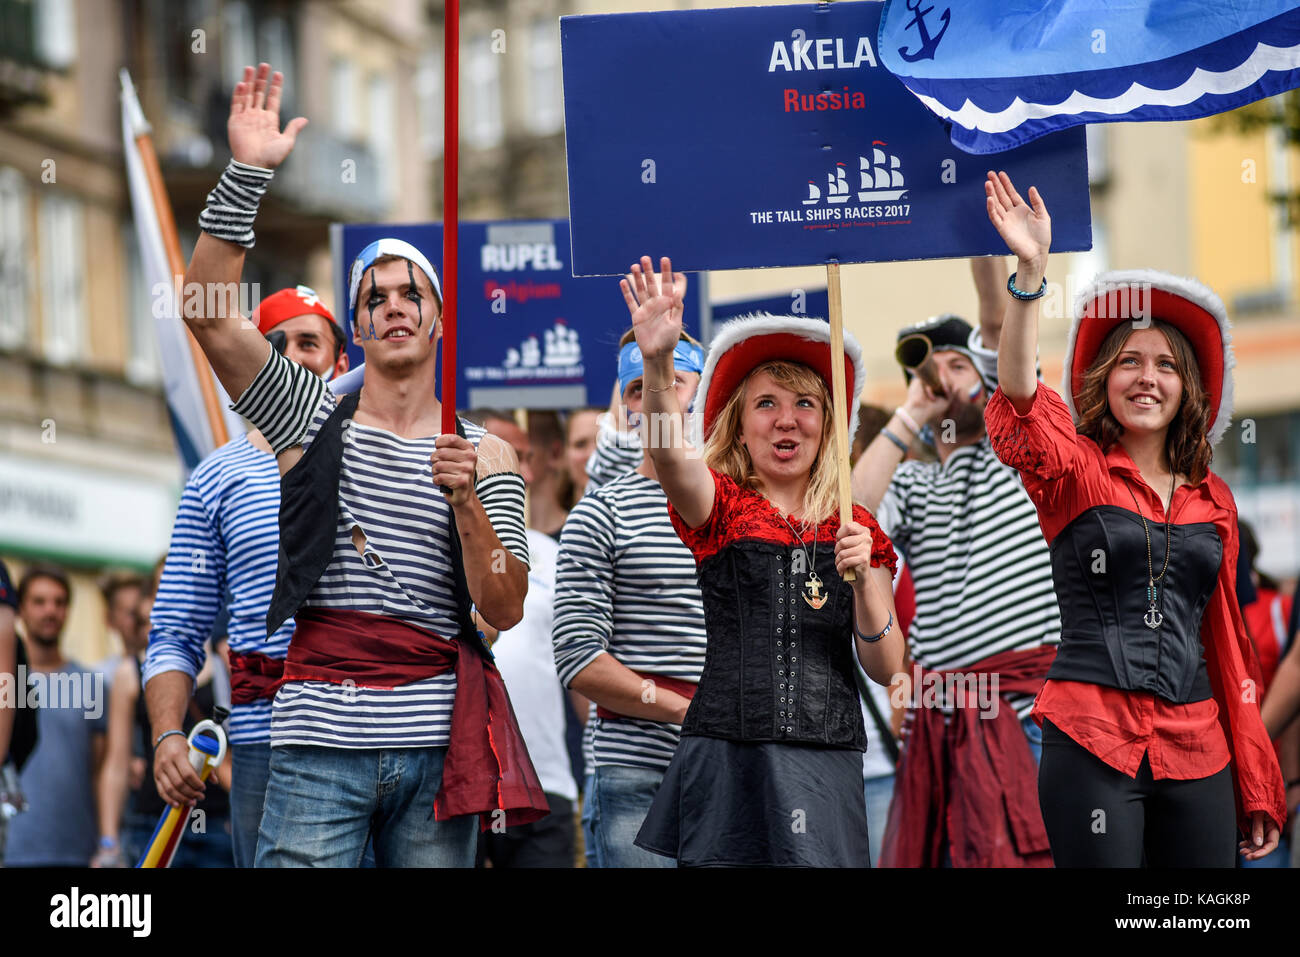 Szczecin, Poland, 6 august 2017: The Tall Ships Races 2017 crew parade in Szczecin, Akela Russia. - Stock Image